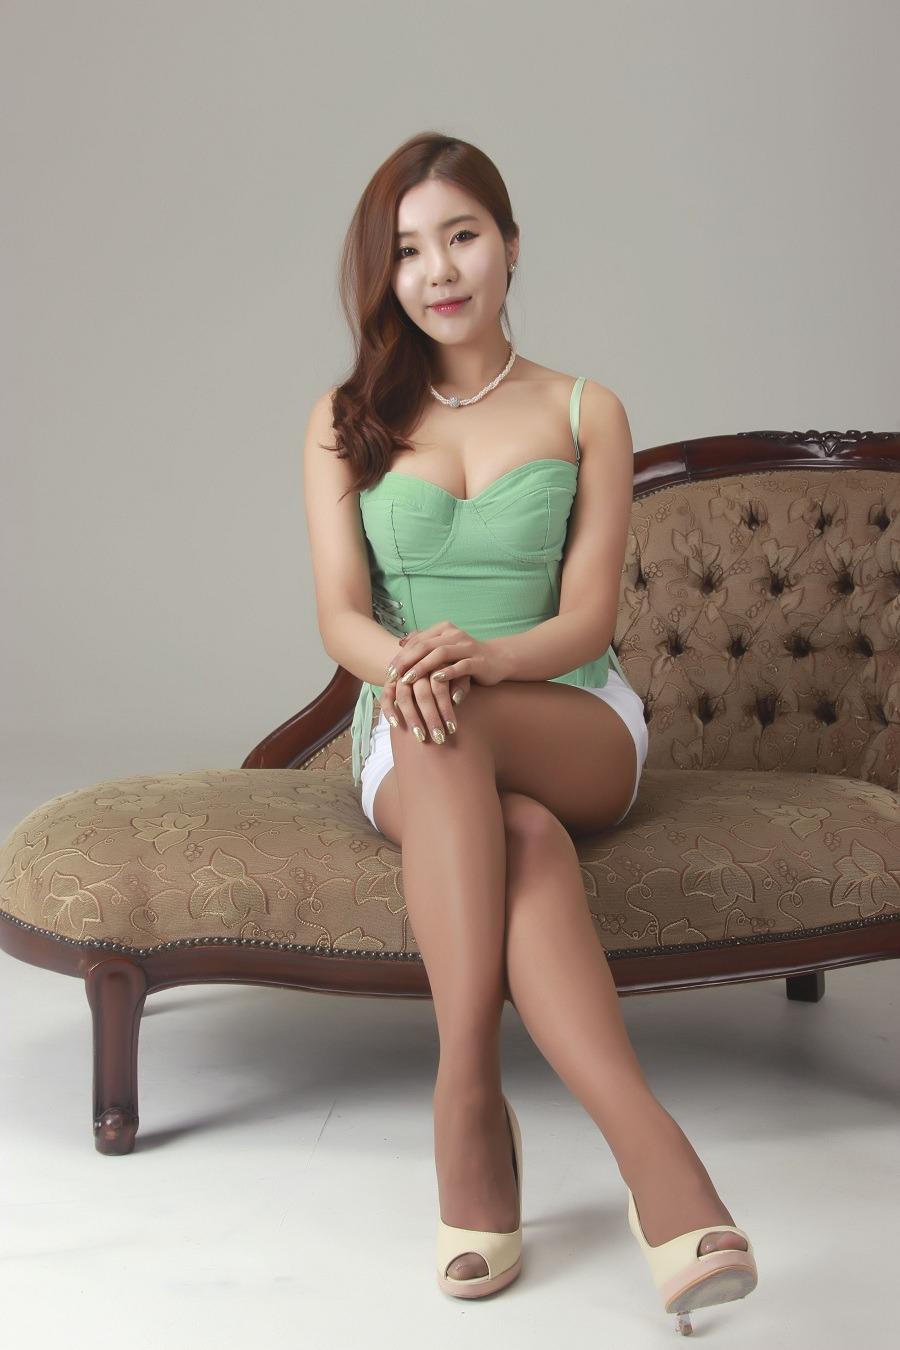 xxx nude girls: New Girl Kim Ji Na